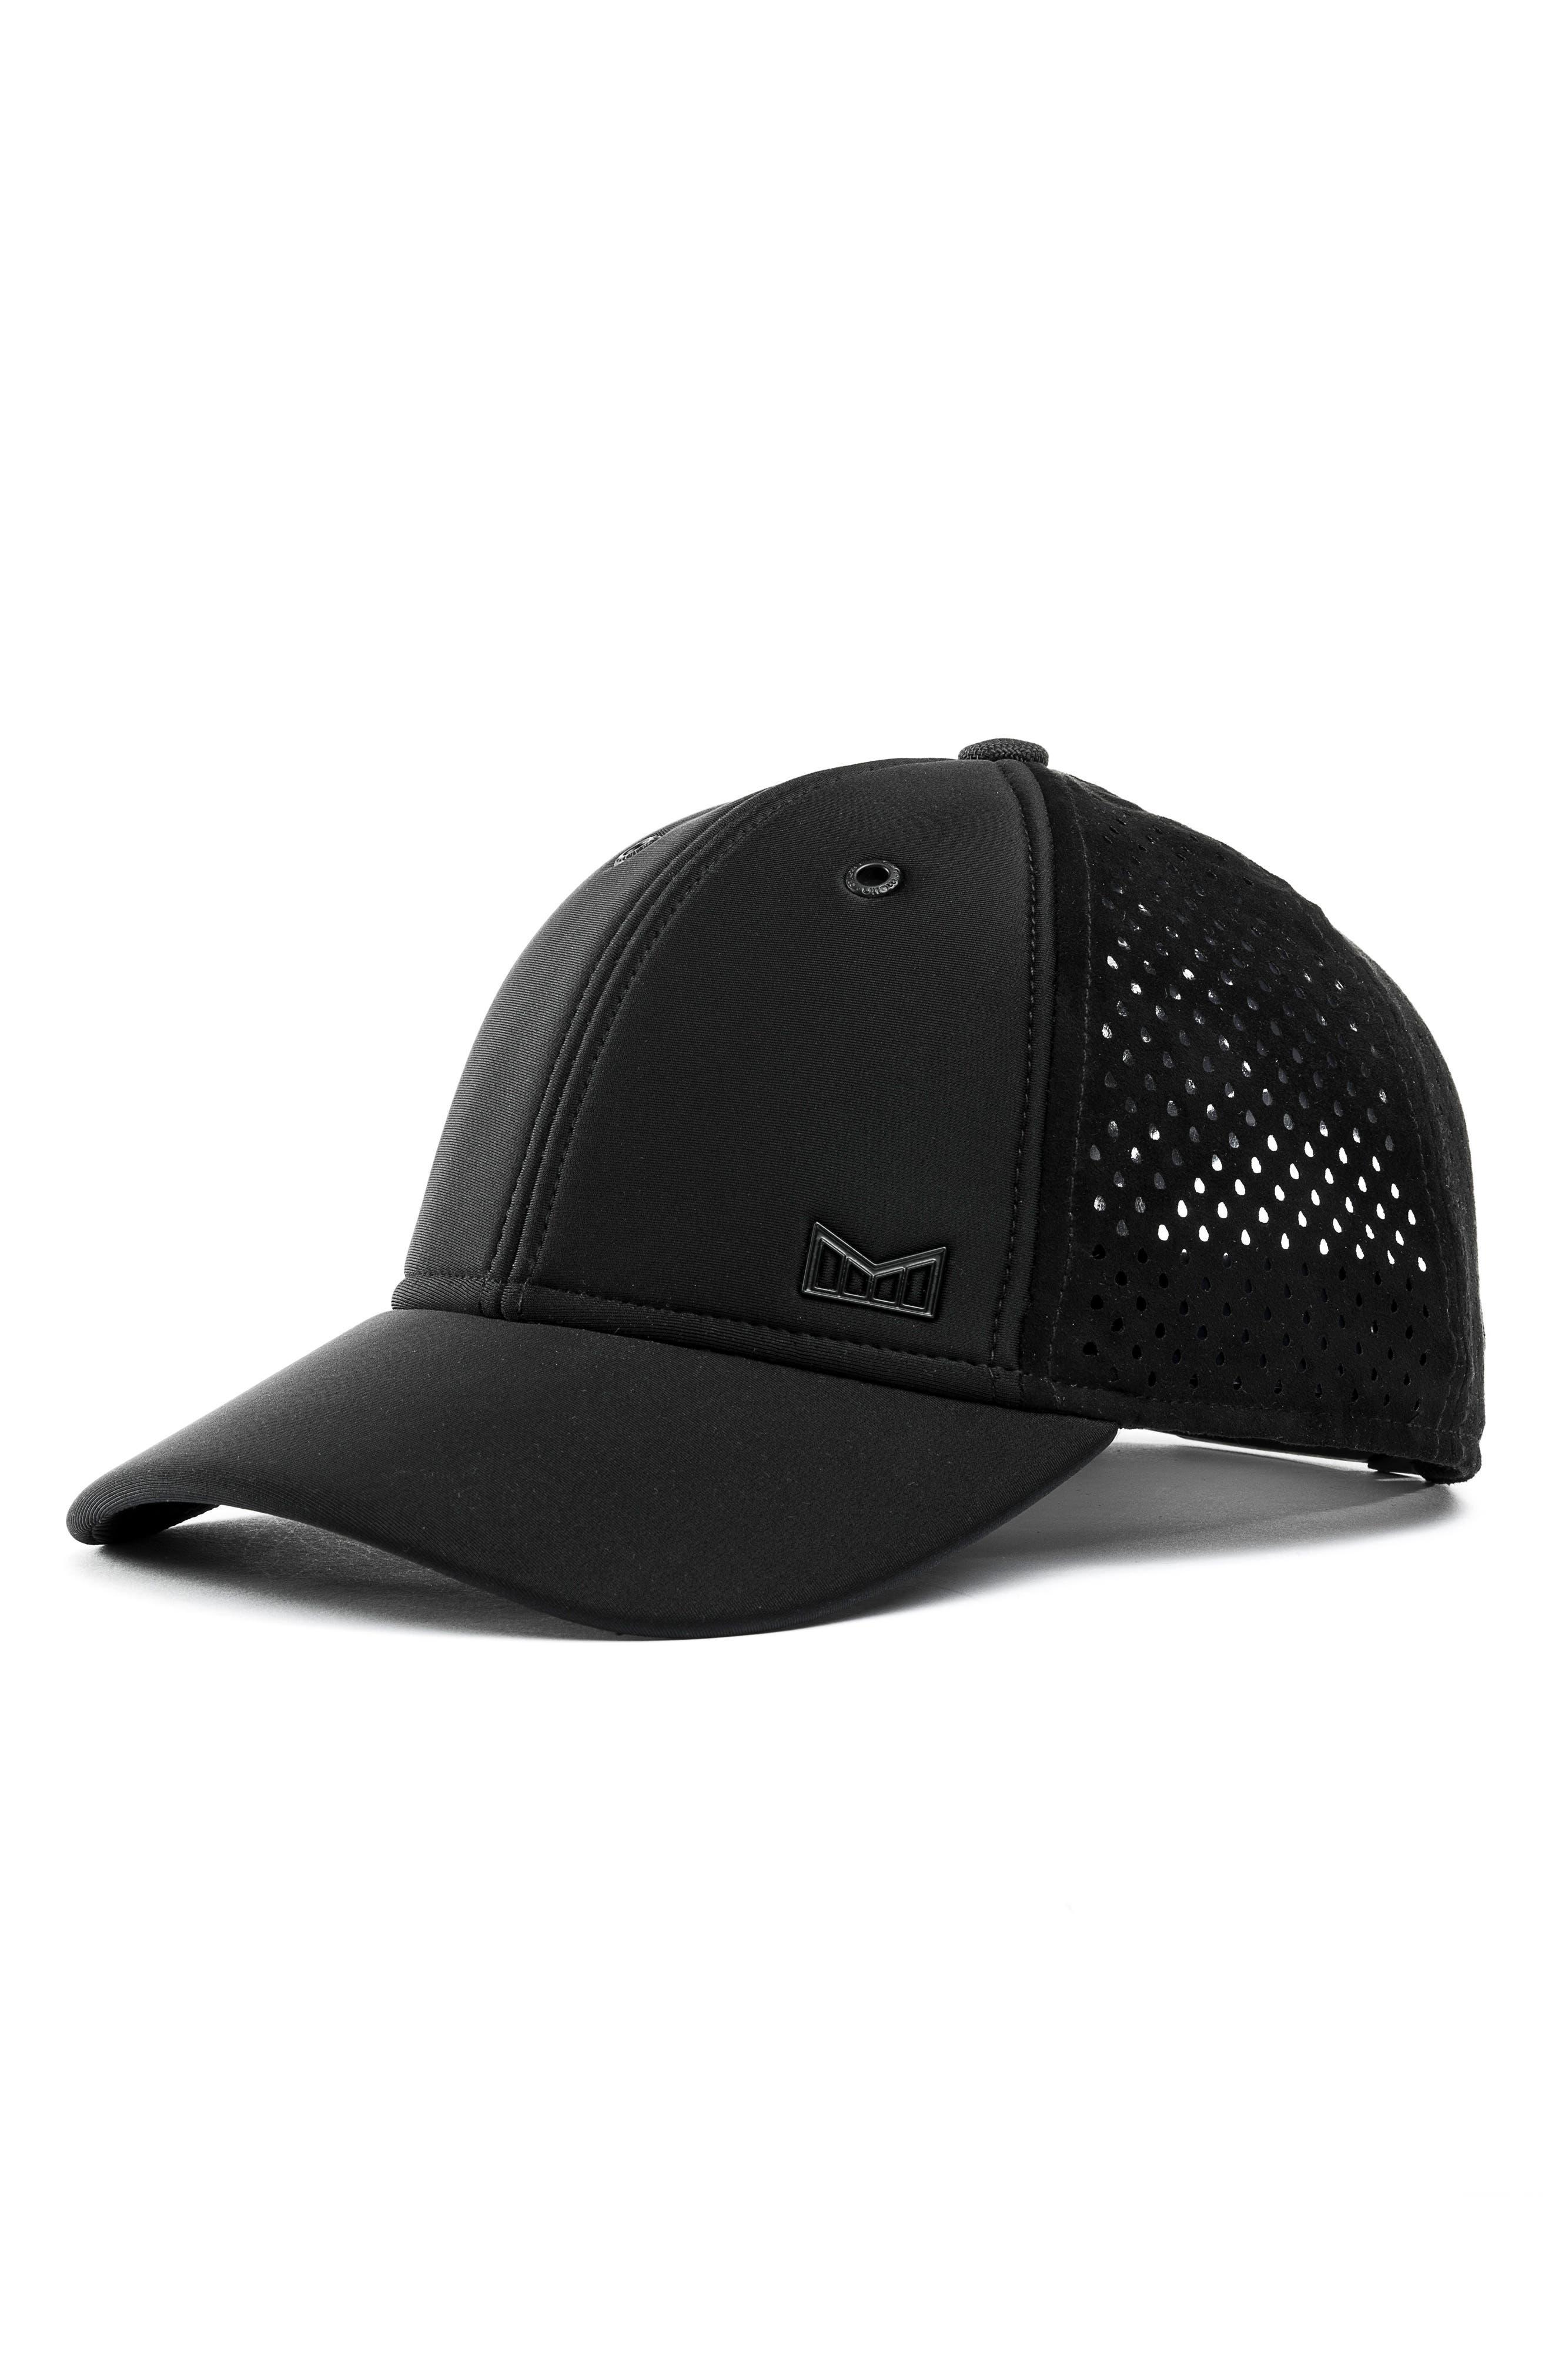 MELIN, Trooper II Snapback Baseball Cap, Main thumbnail 1, color, BLACK